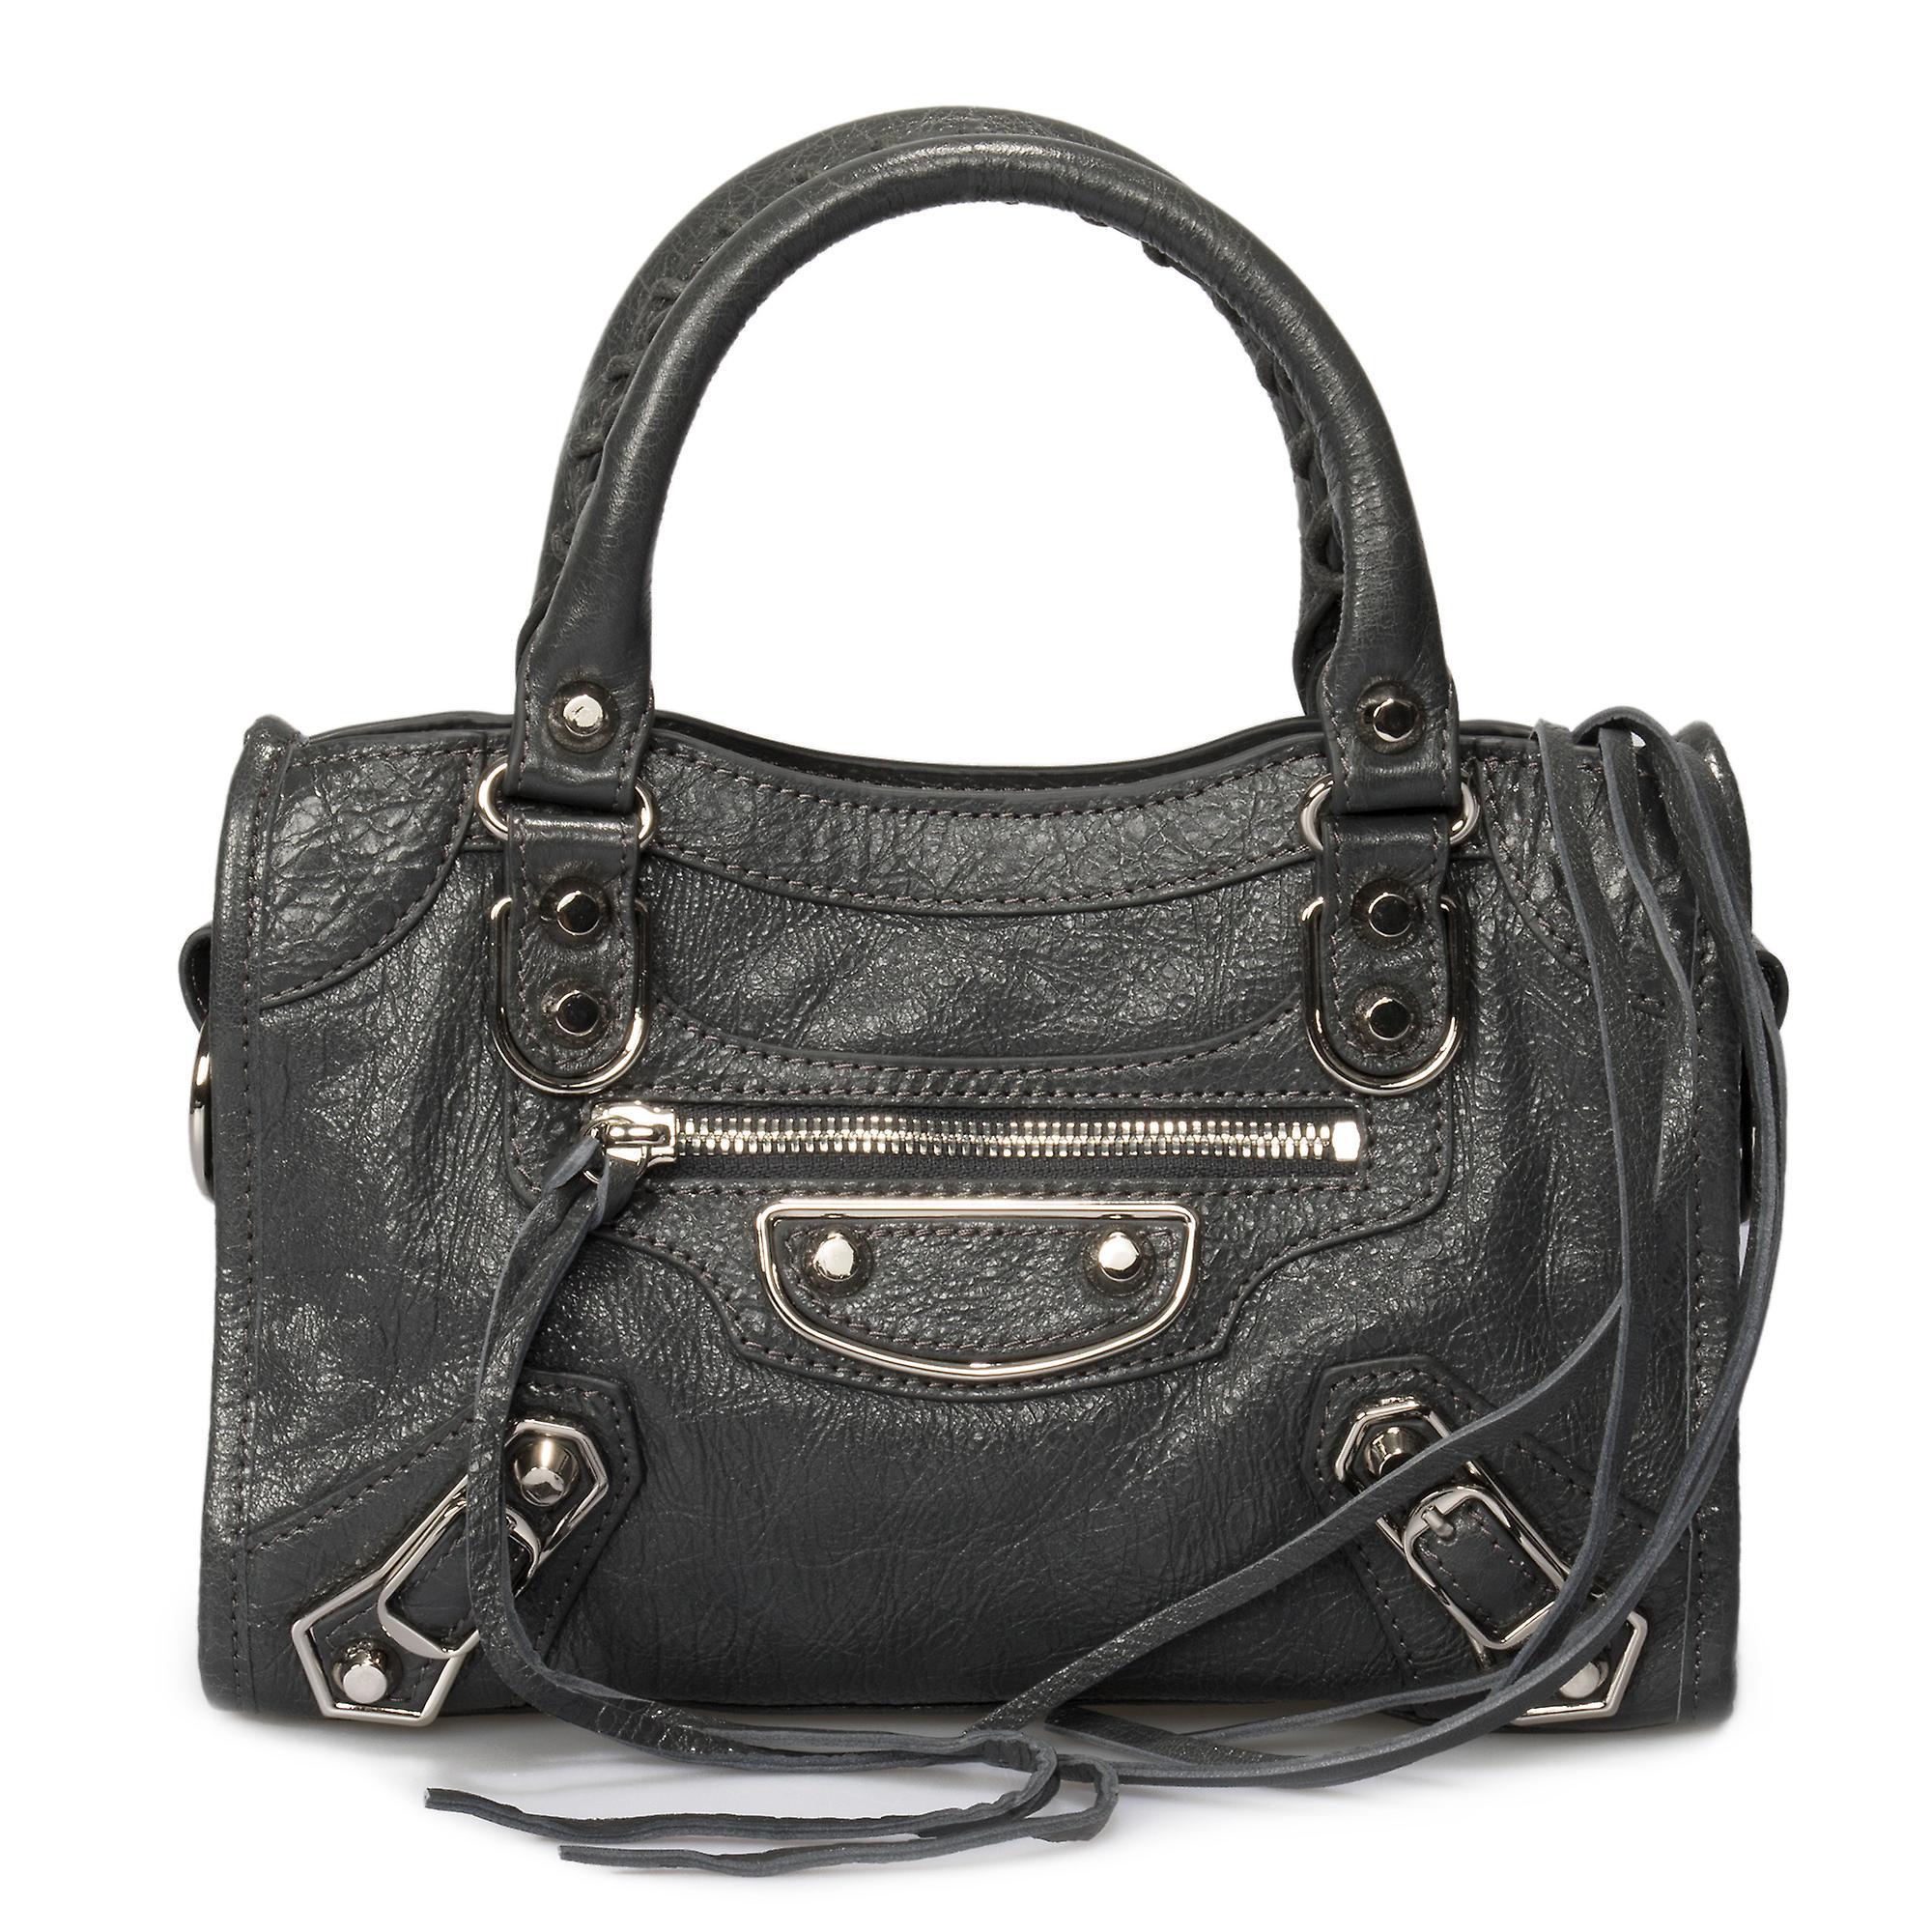 Balenciaga Classic metallic Edge City väska | Grå med silver Hardware | Mini